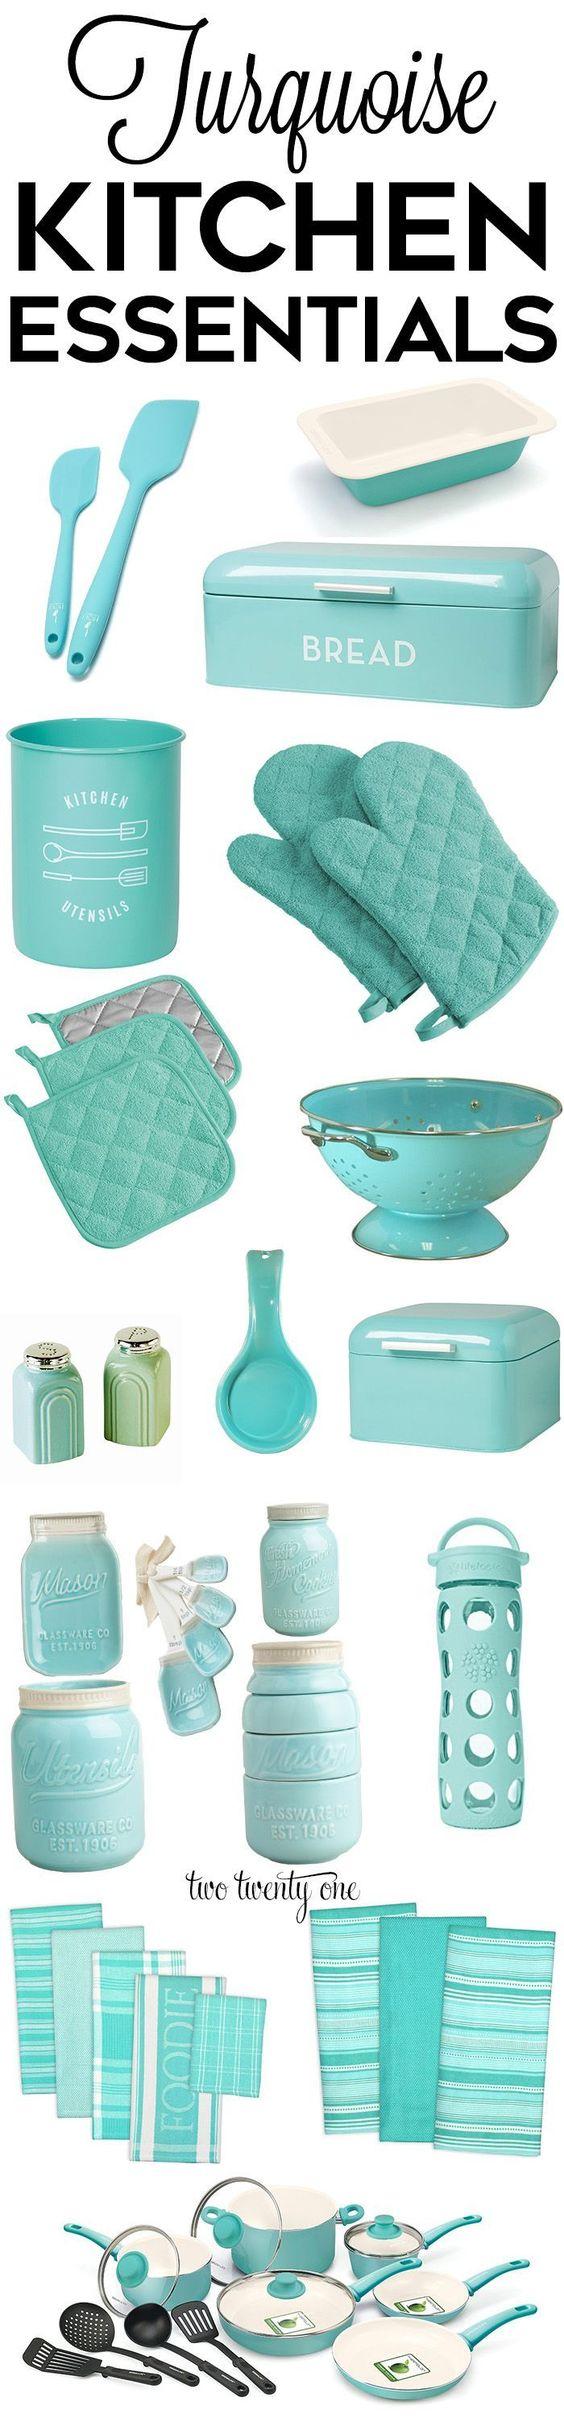 Turquoise Kitchen Decor Turquoise Kitchen And Appliances On Pinterest